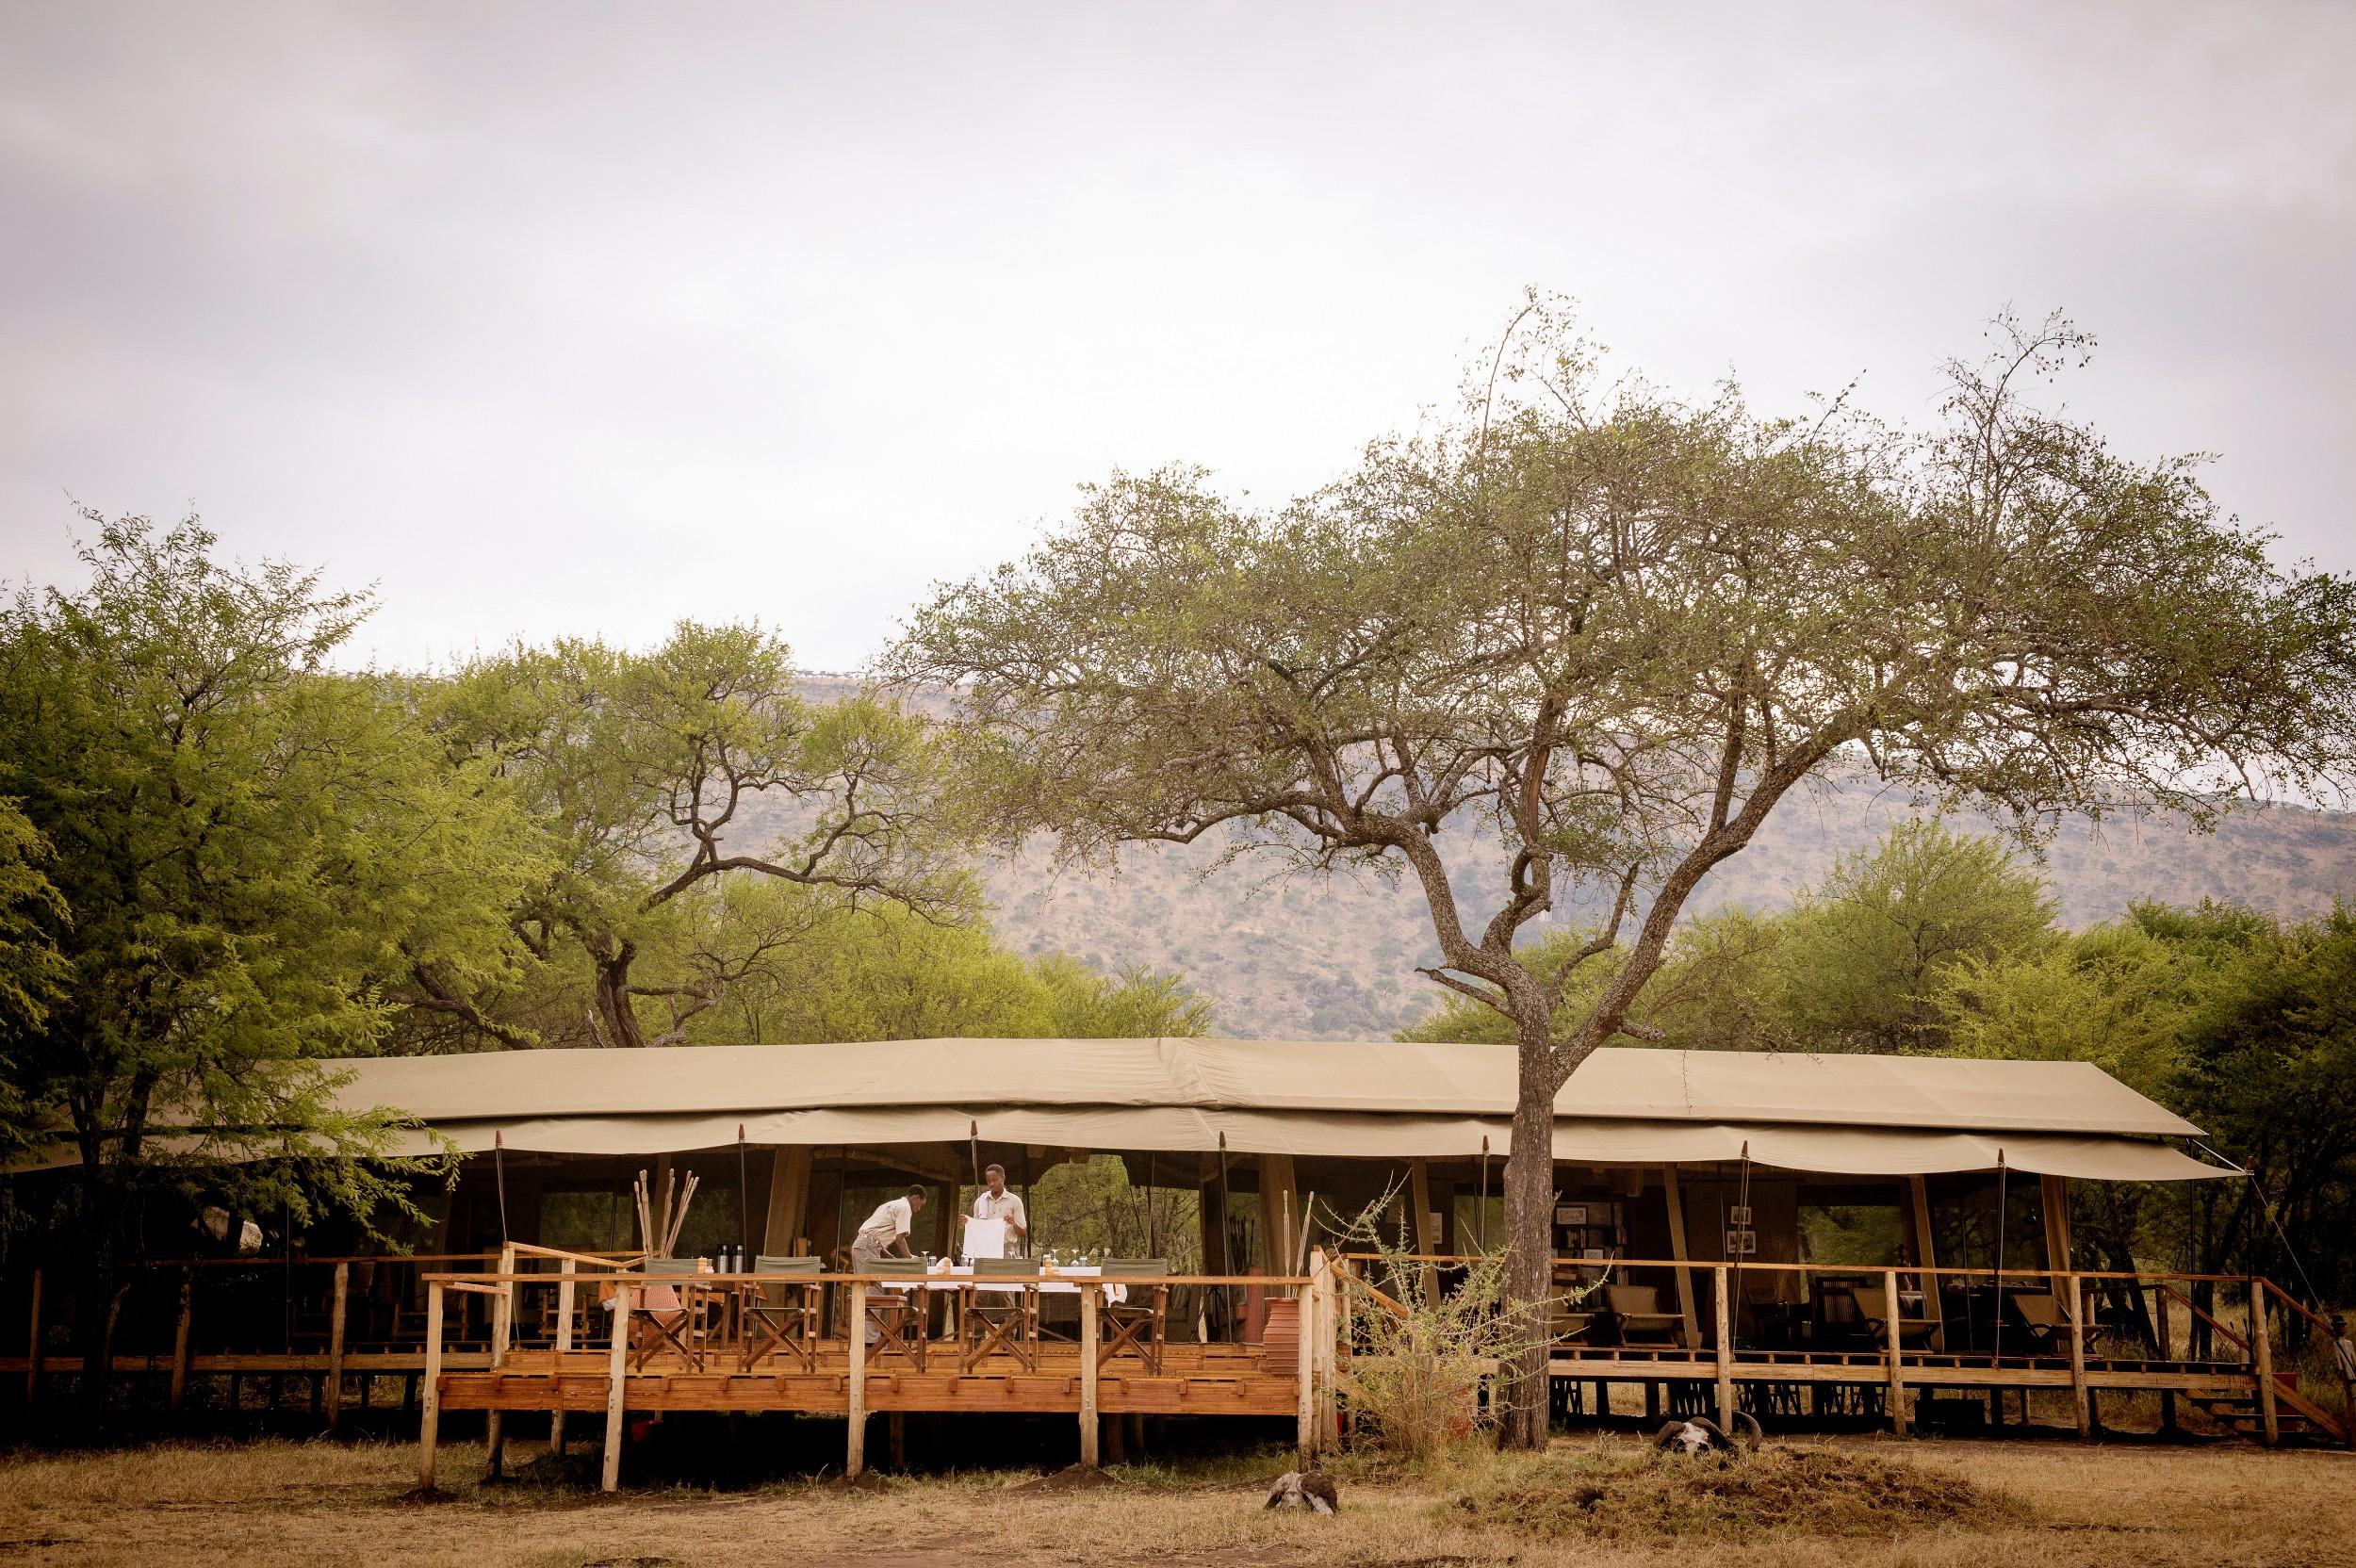 Dunia-Camp-mess-tent-exterioir-3-Eliza-Deacon-HR.jpg